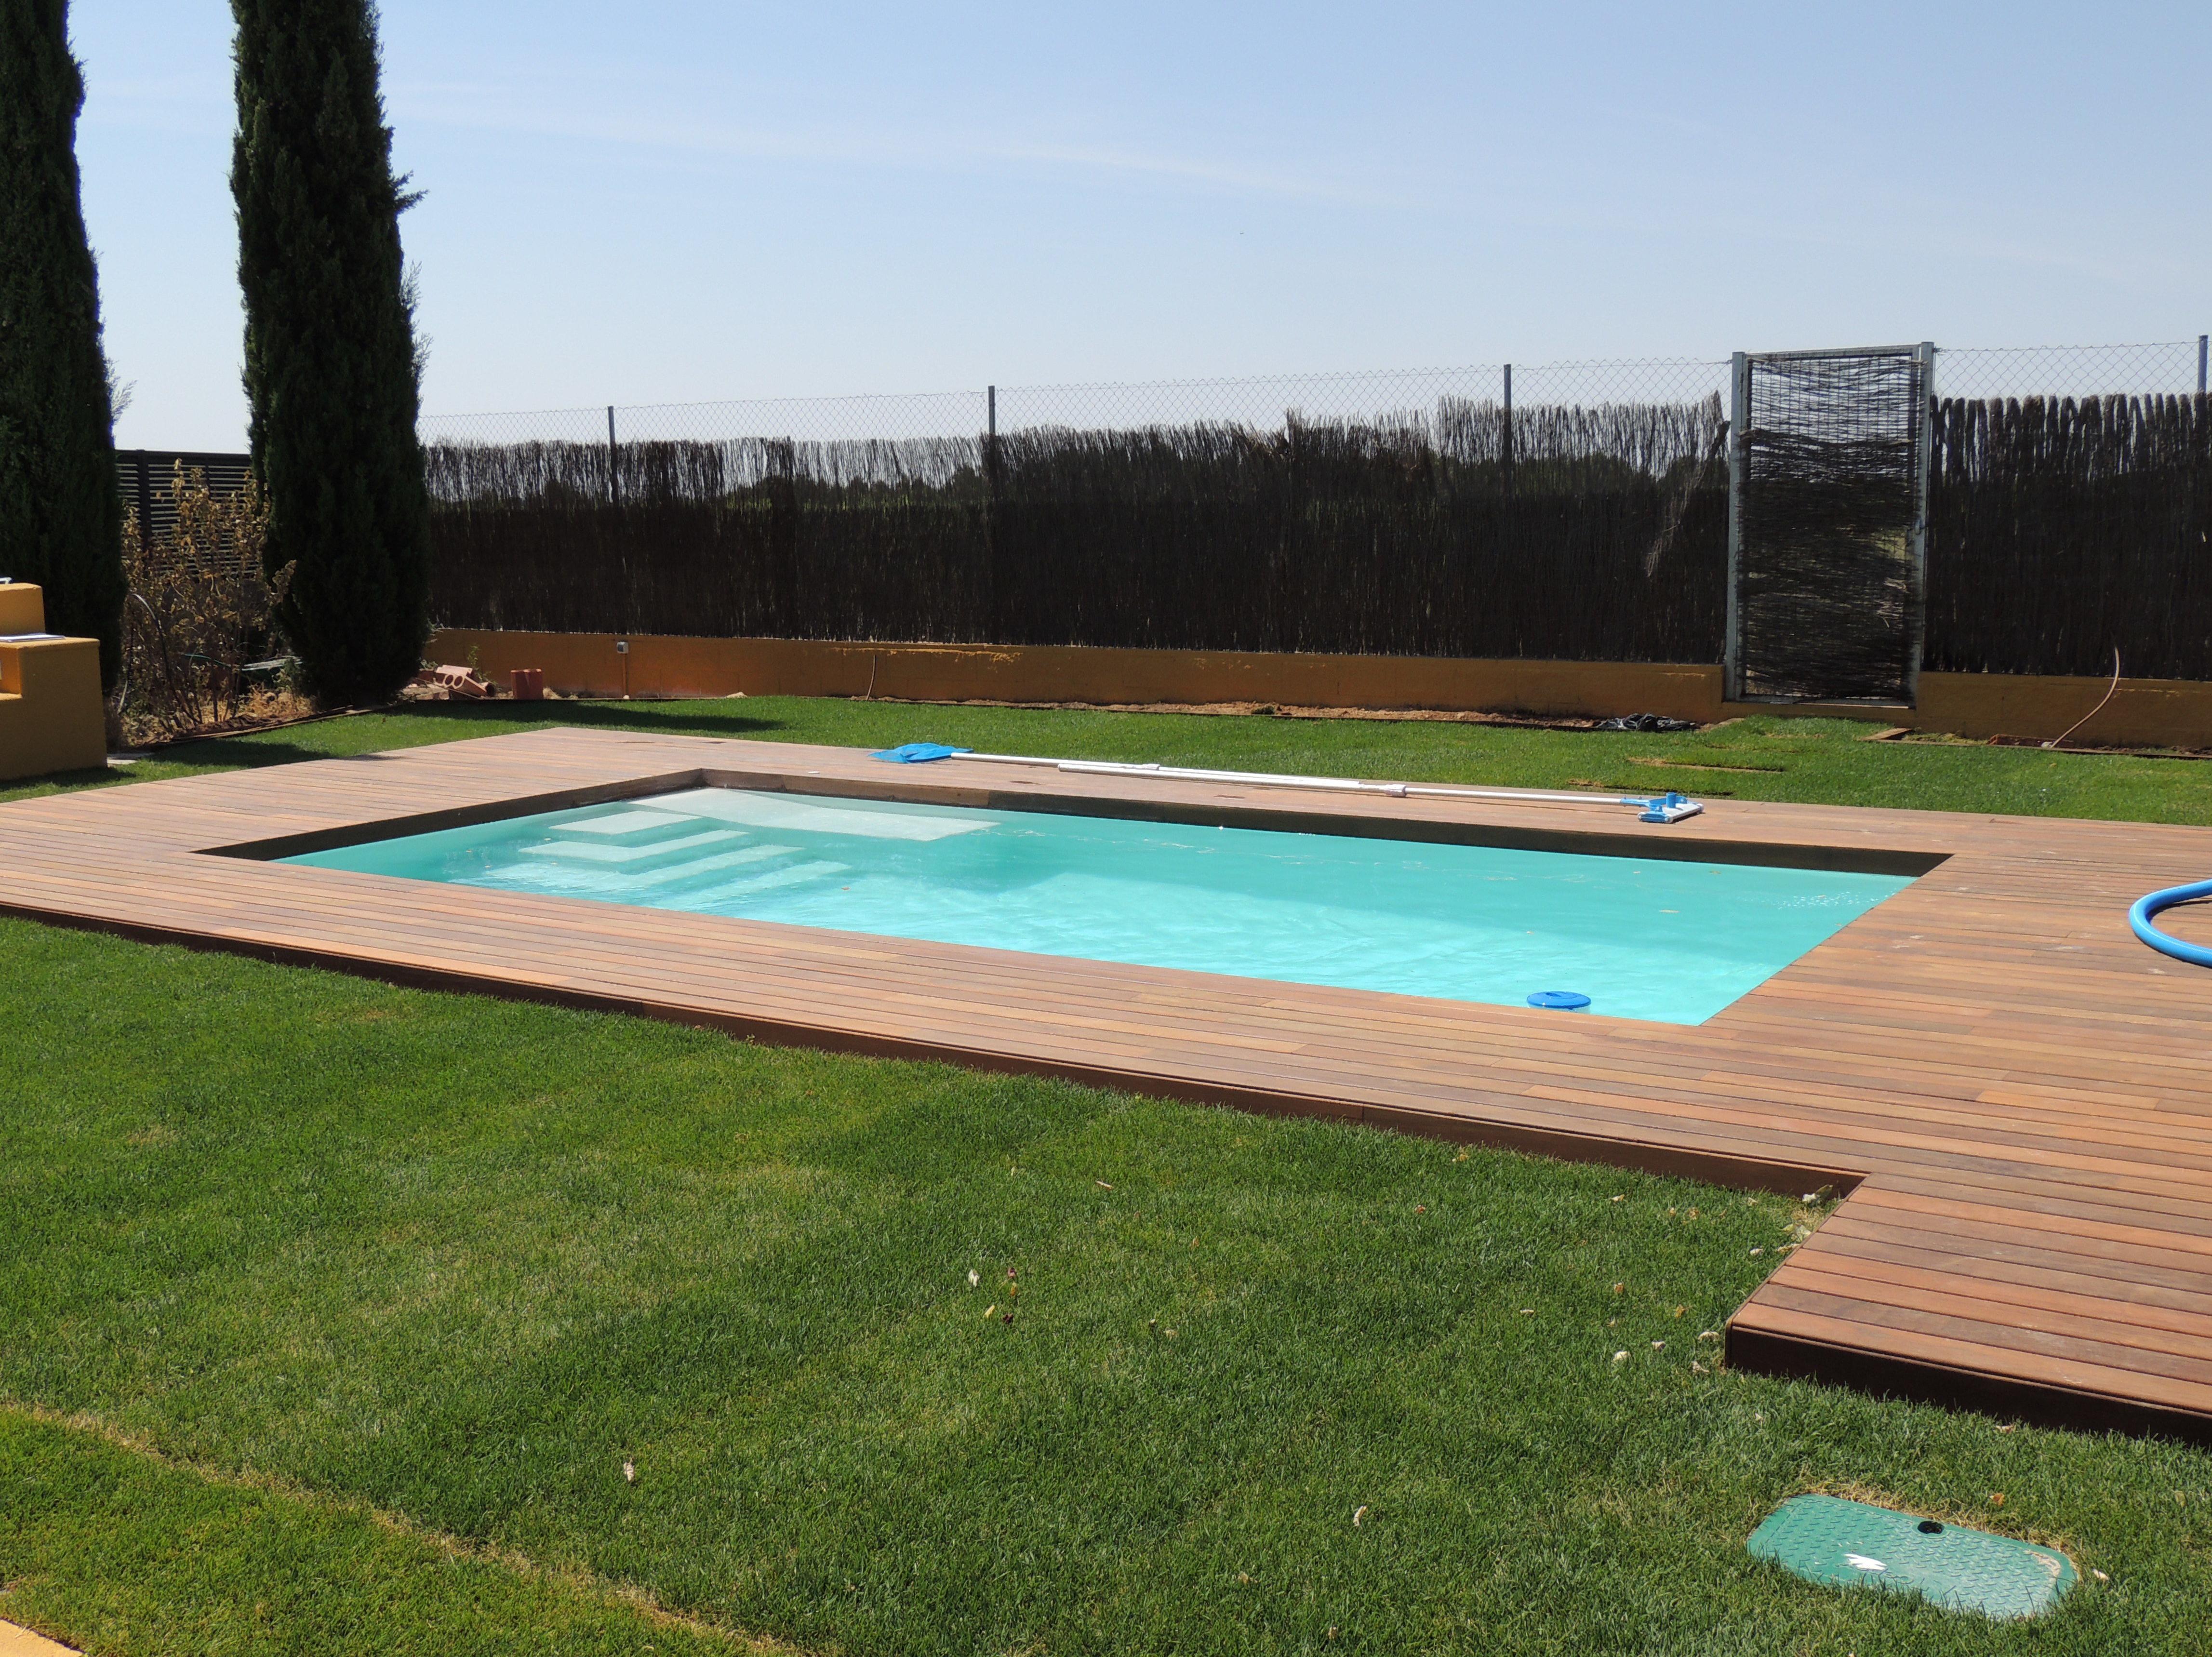 Construcci n de piscinas en madrid centro para disfrutar for Piscinas exteriores